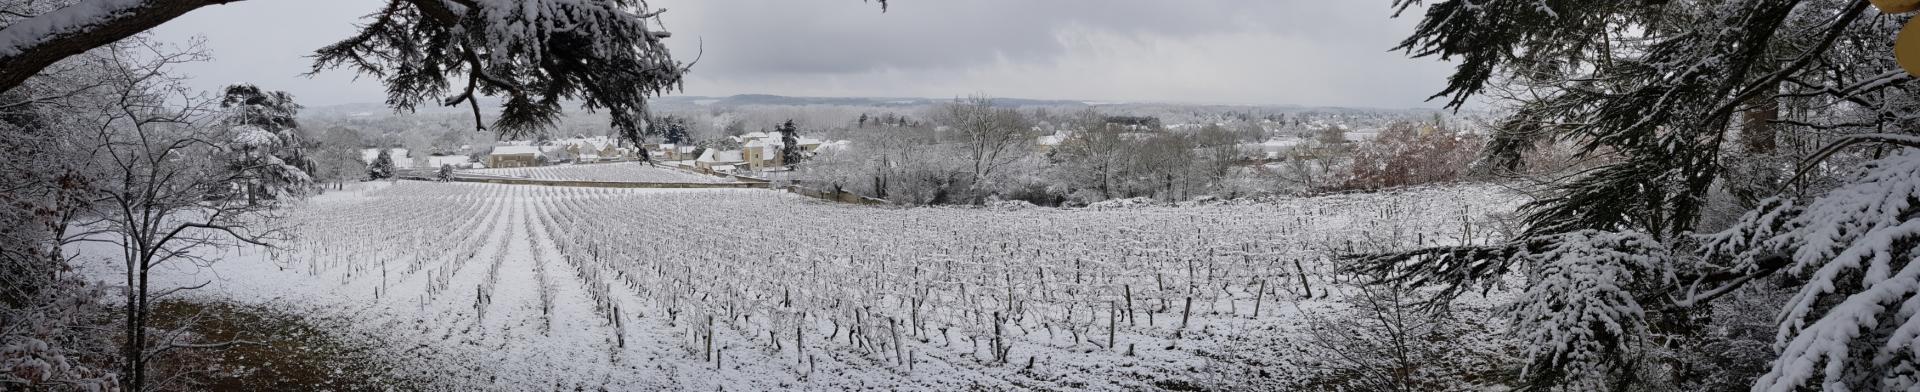 de coulaine snow vineyards panorama